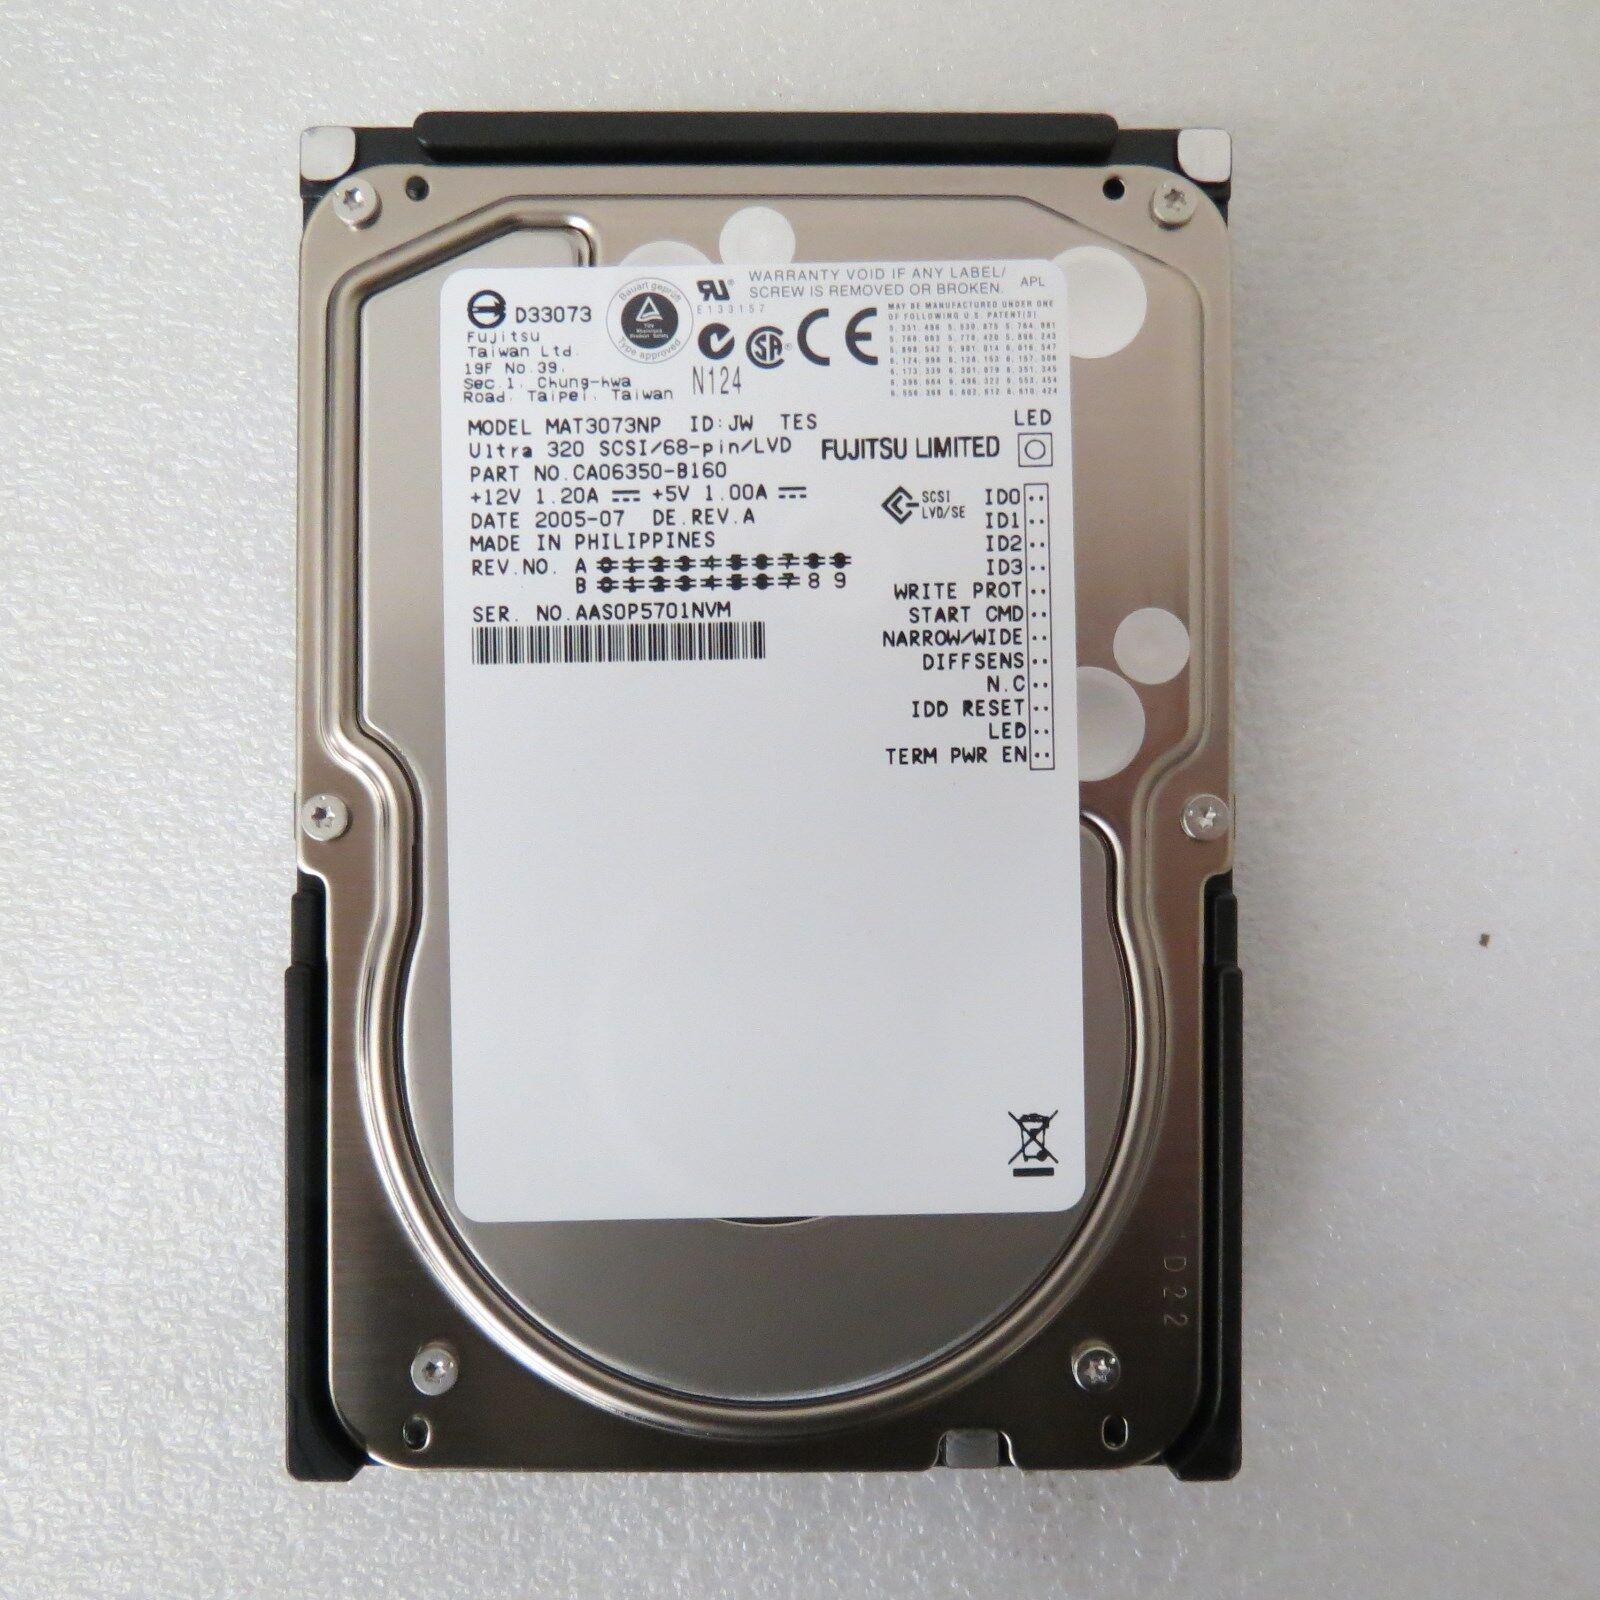 "Aasop fujitsu 73.5 gb,internal,10000 rpm,3.5"" (mat3073np) hard drive"